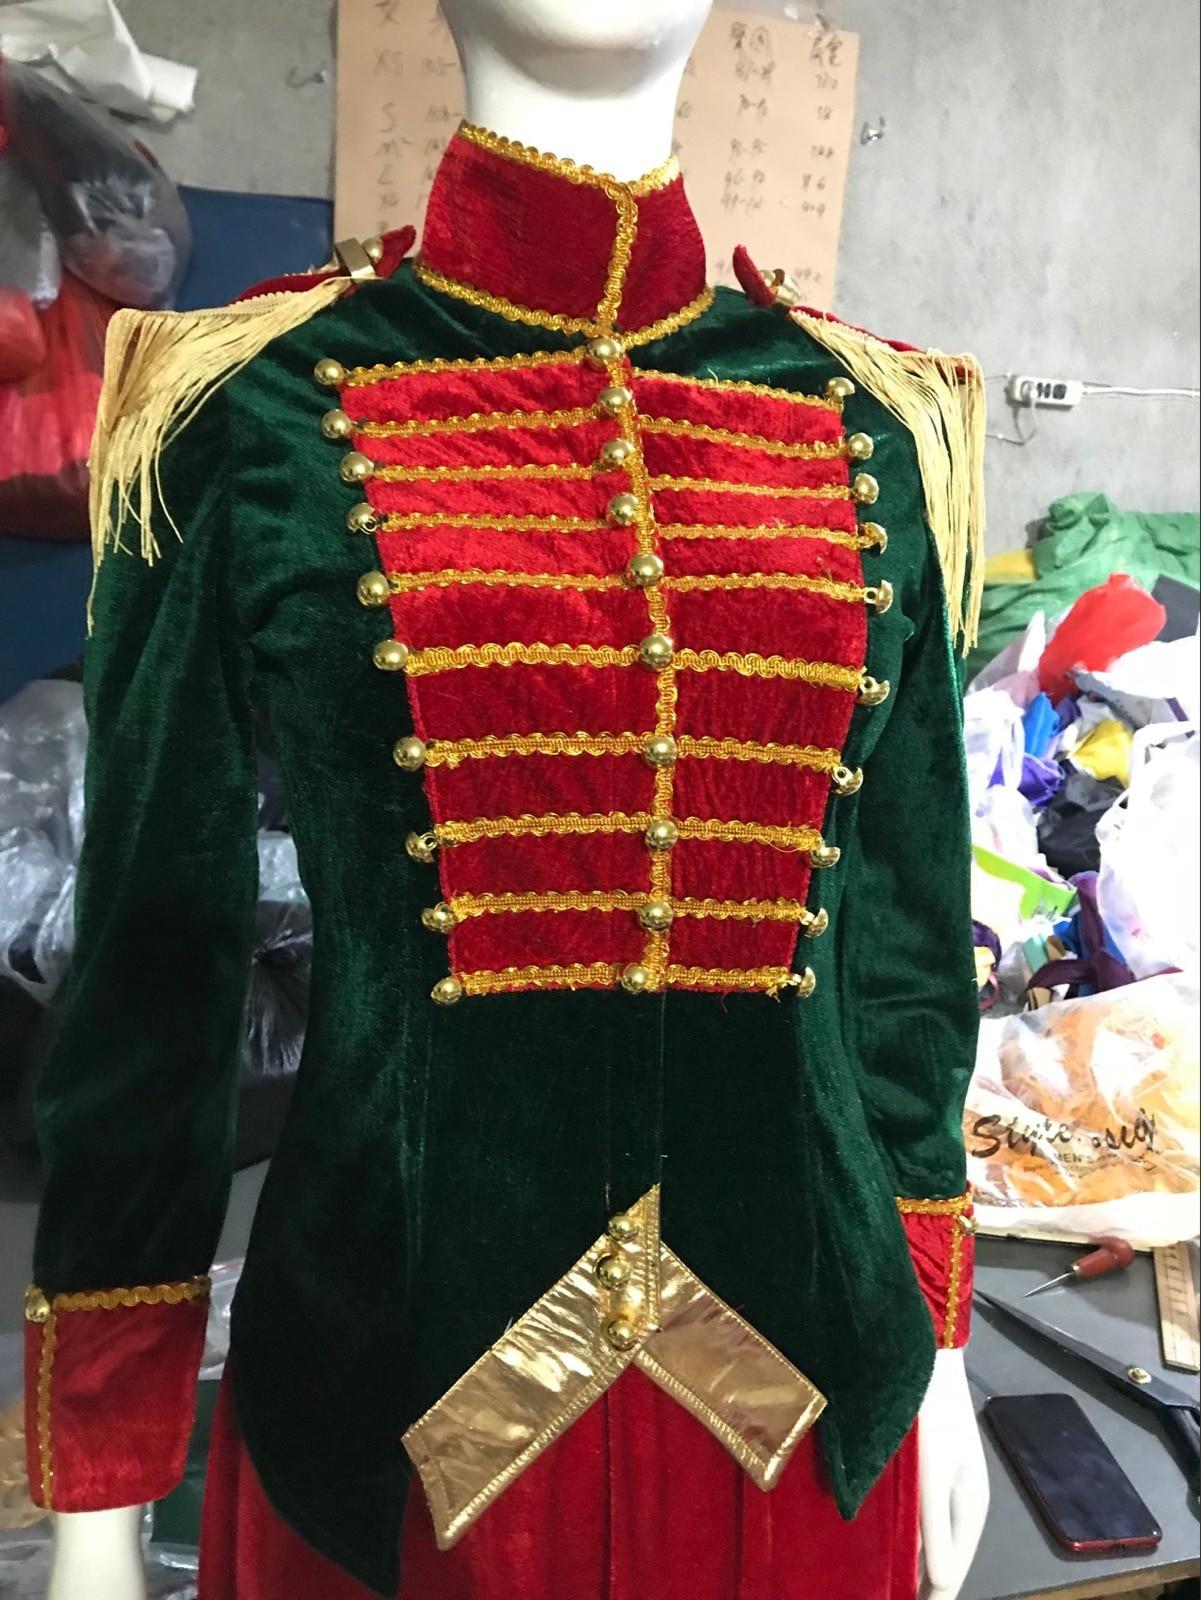 The Nutcracker And The Four Realms  Women Clara Costume Princess Clara Mackenzie Foy fancy suit dress costumes